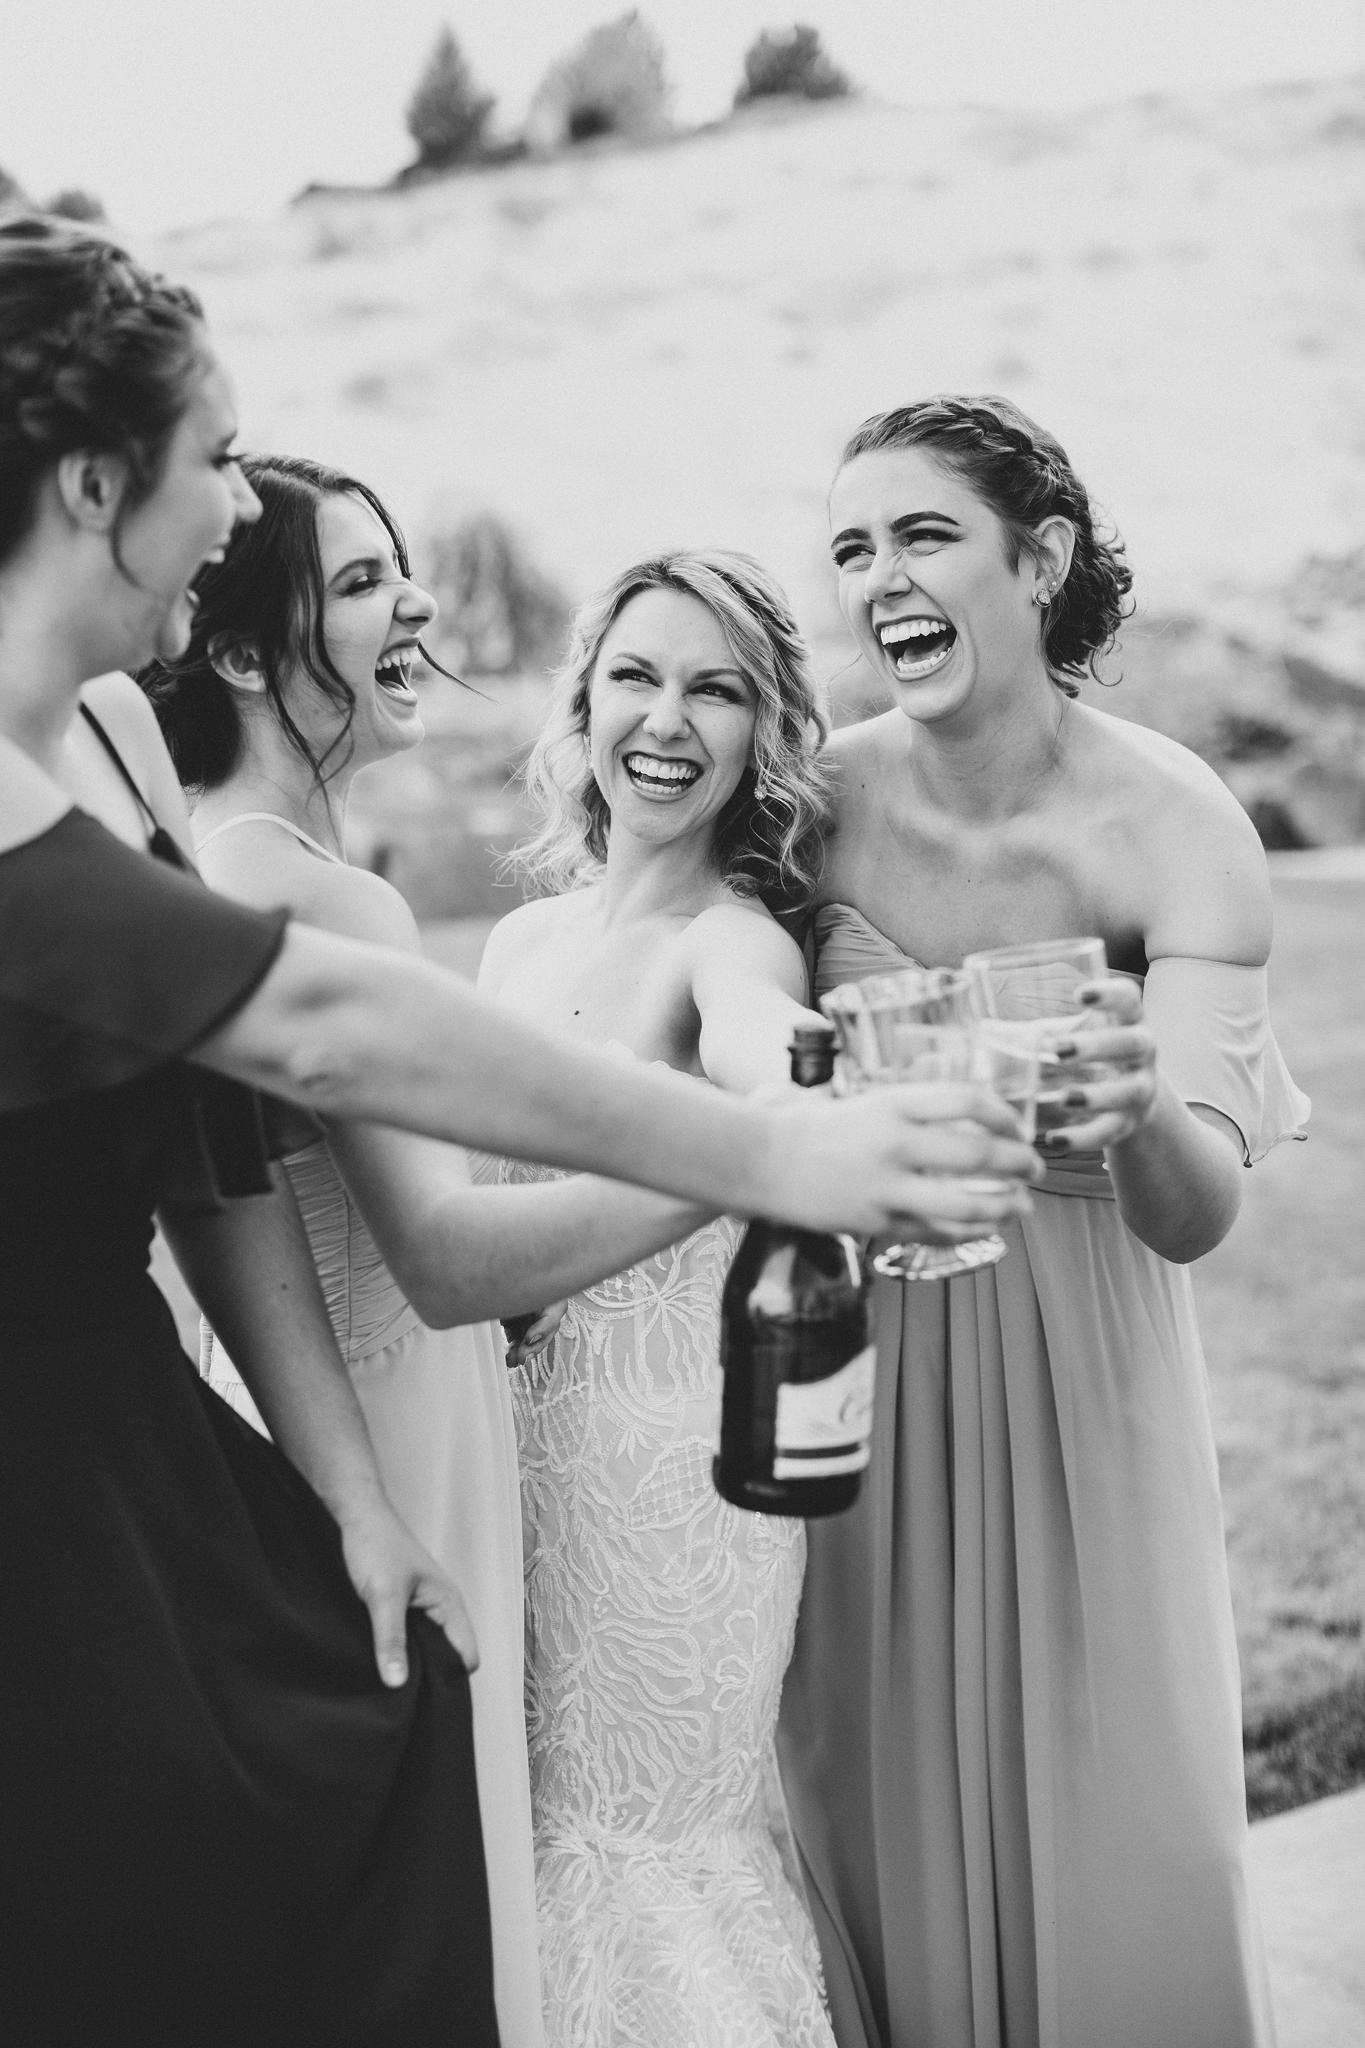 509Bride_The 509 bride_Jordan Edens Photography_washington wedding photographer_tri cities wedding photographer_tri cities photographer_kennewick photographer_richland photographer_wedding_wedding photographer_16